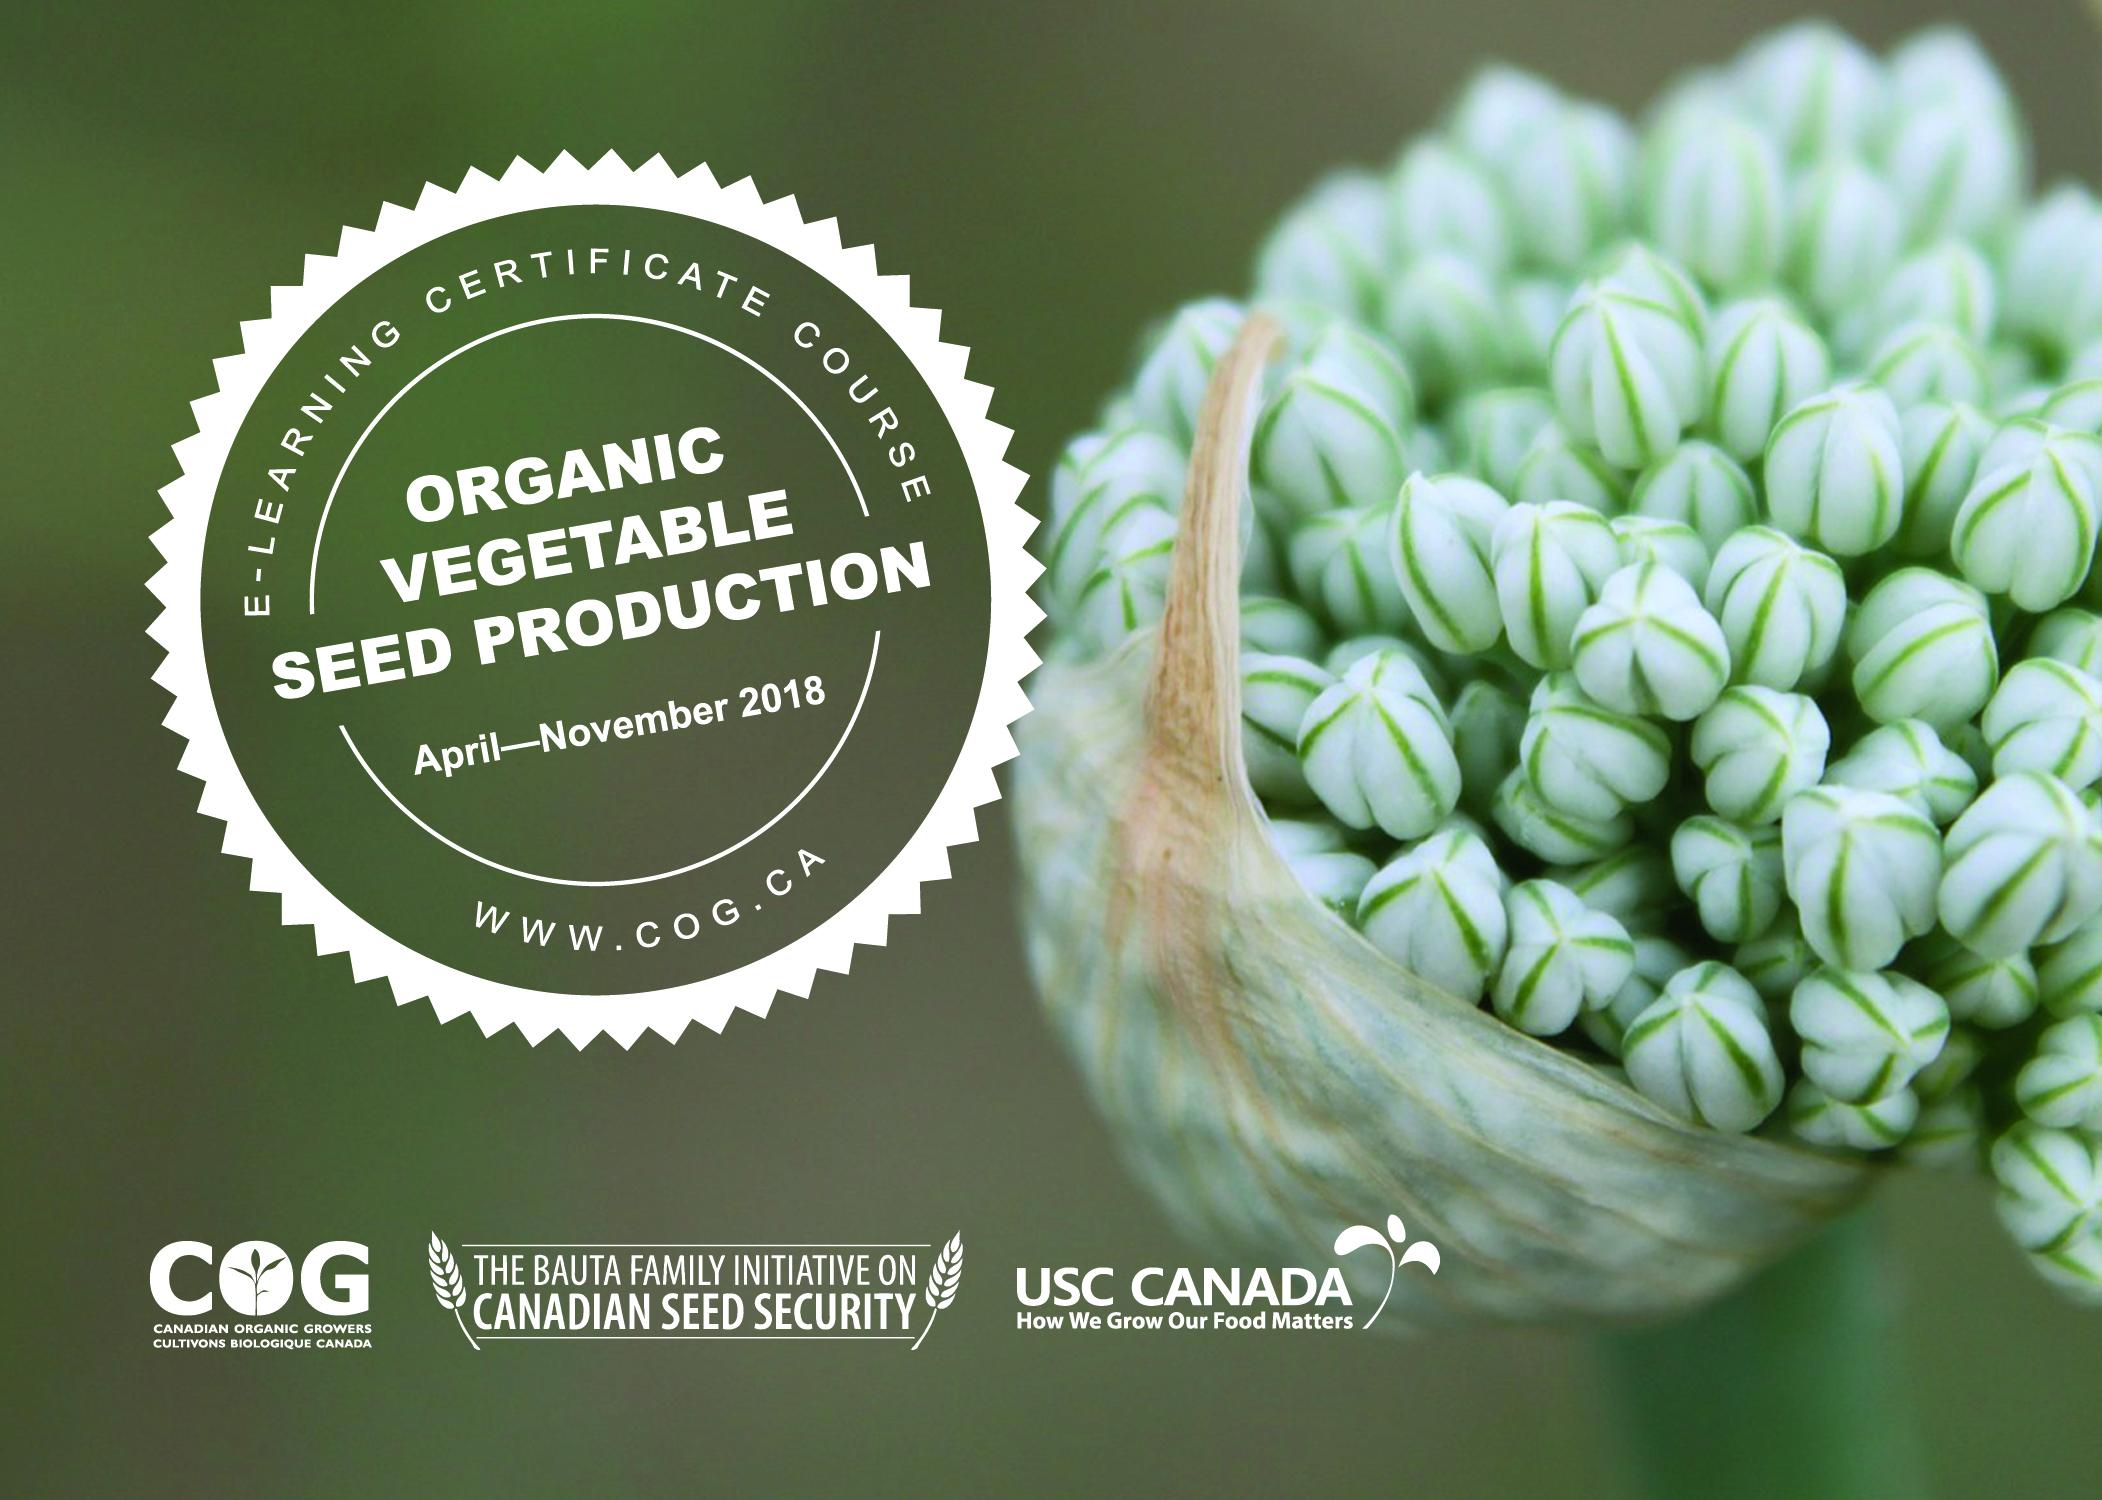 seed_production_cog.jpg